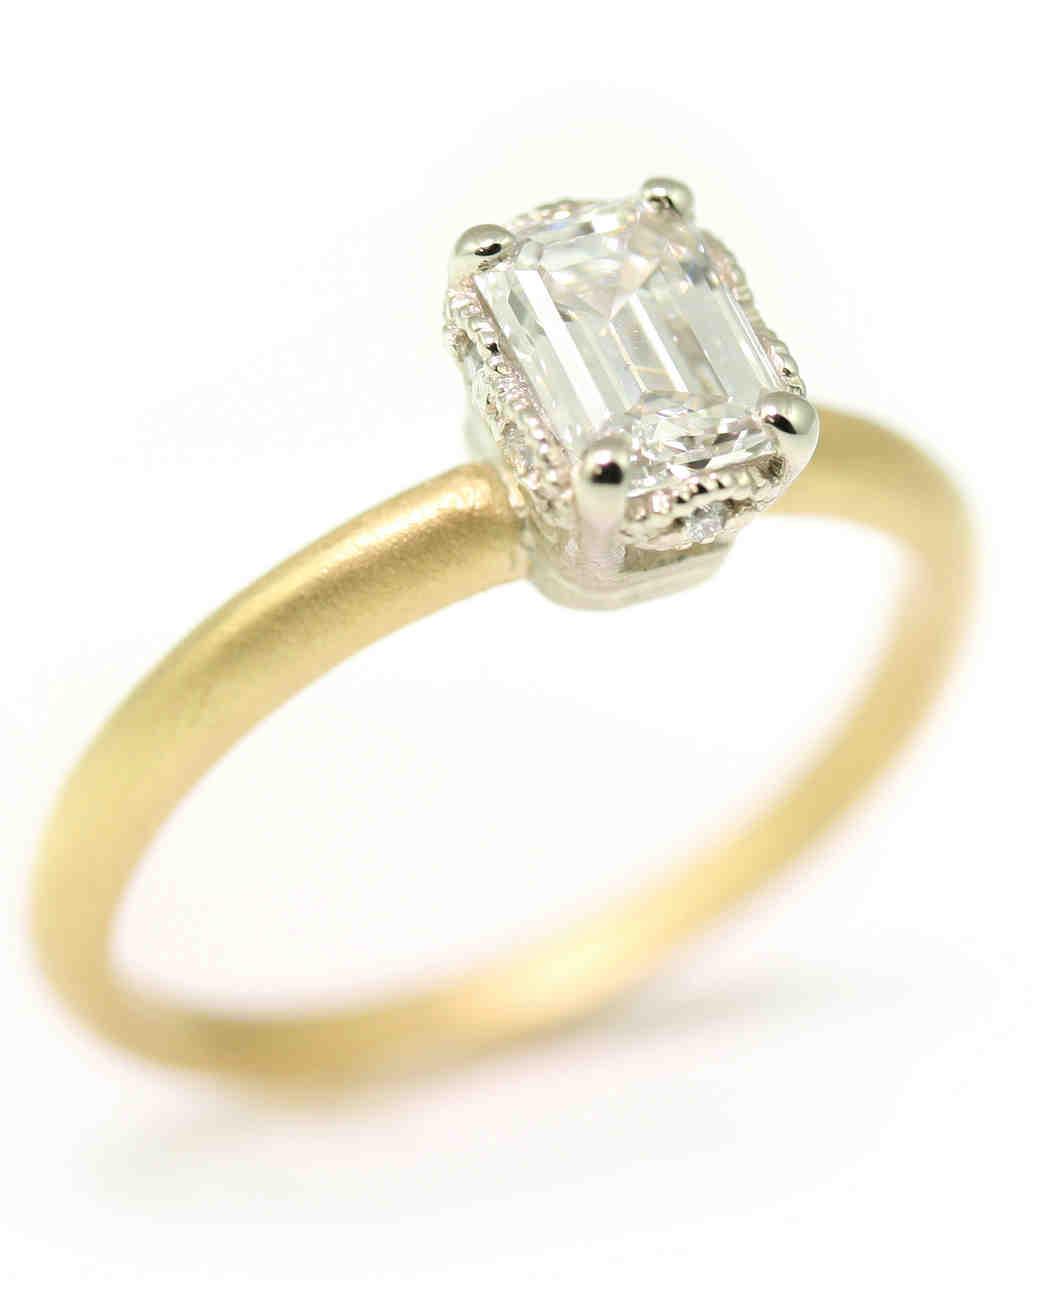 Megan Thorne Emerald-Cut Engagement Ring